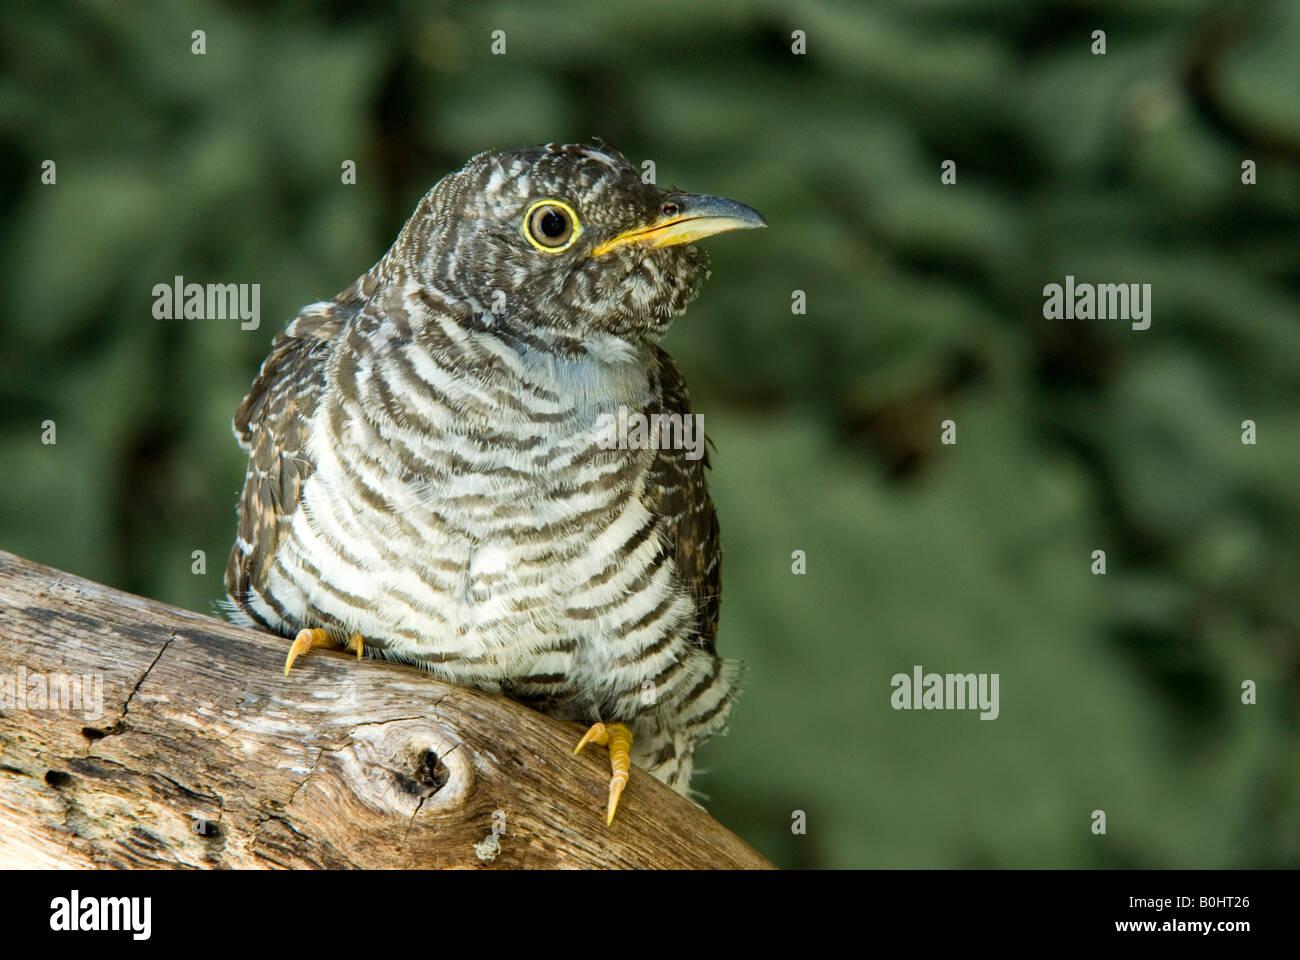 Common Cuckoo (Cuculus canorus), Schwaz, Tyrol, Austria, Europe - Stock Image